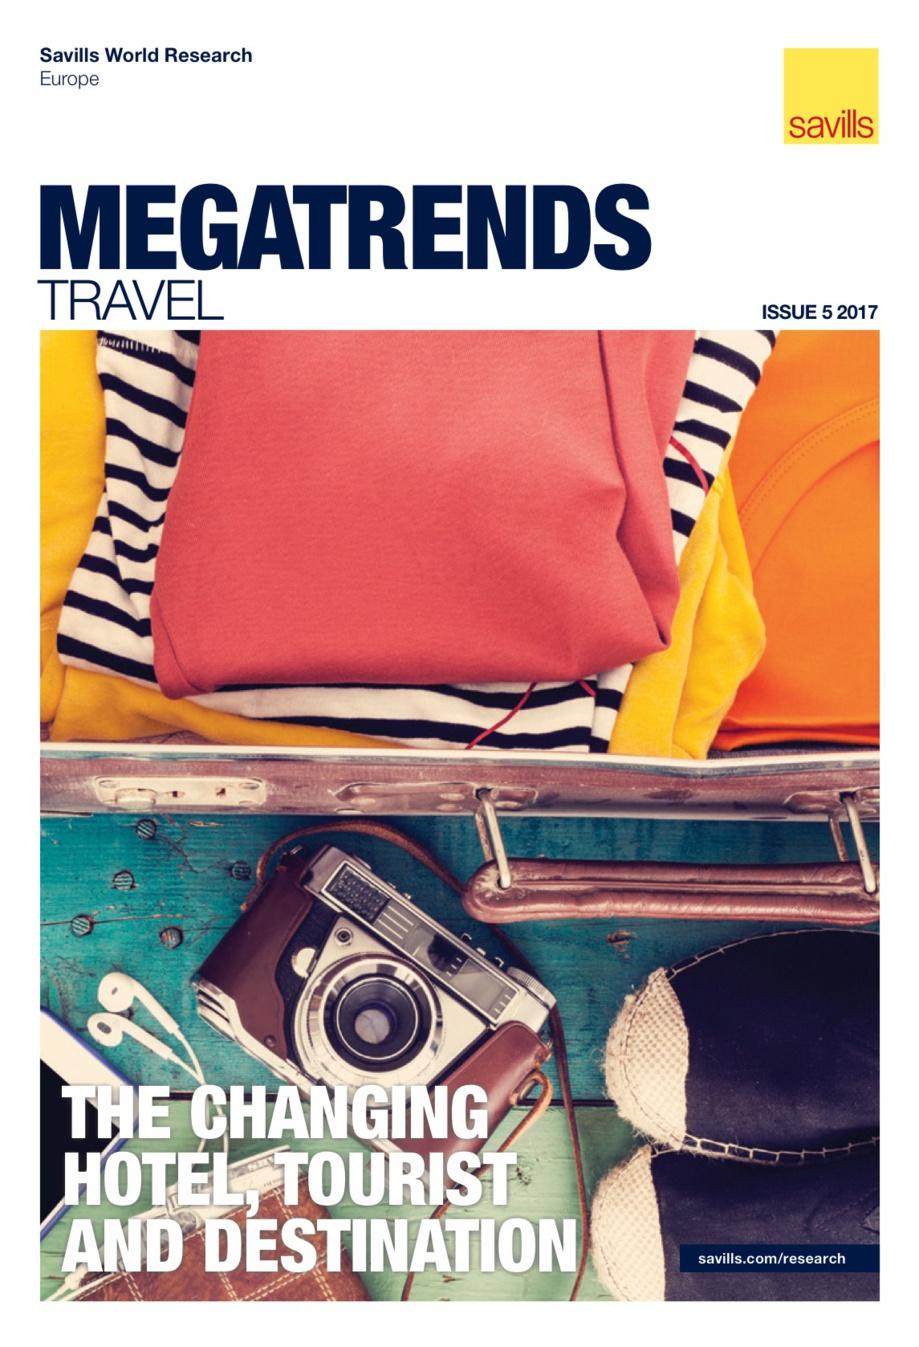 Savills - Europe Megatrends Travel – Issue 5 2017